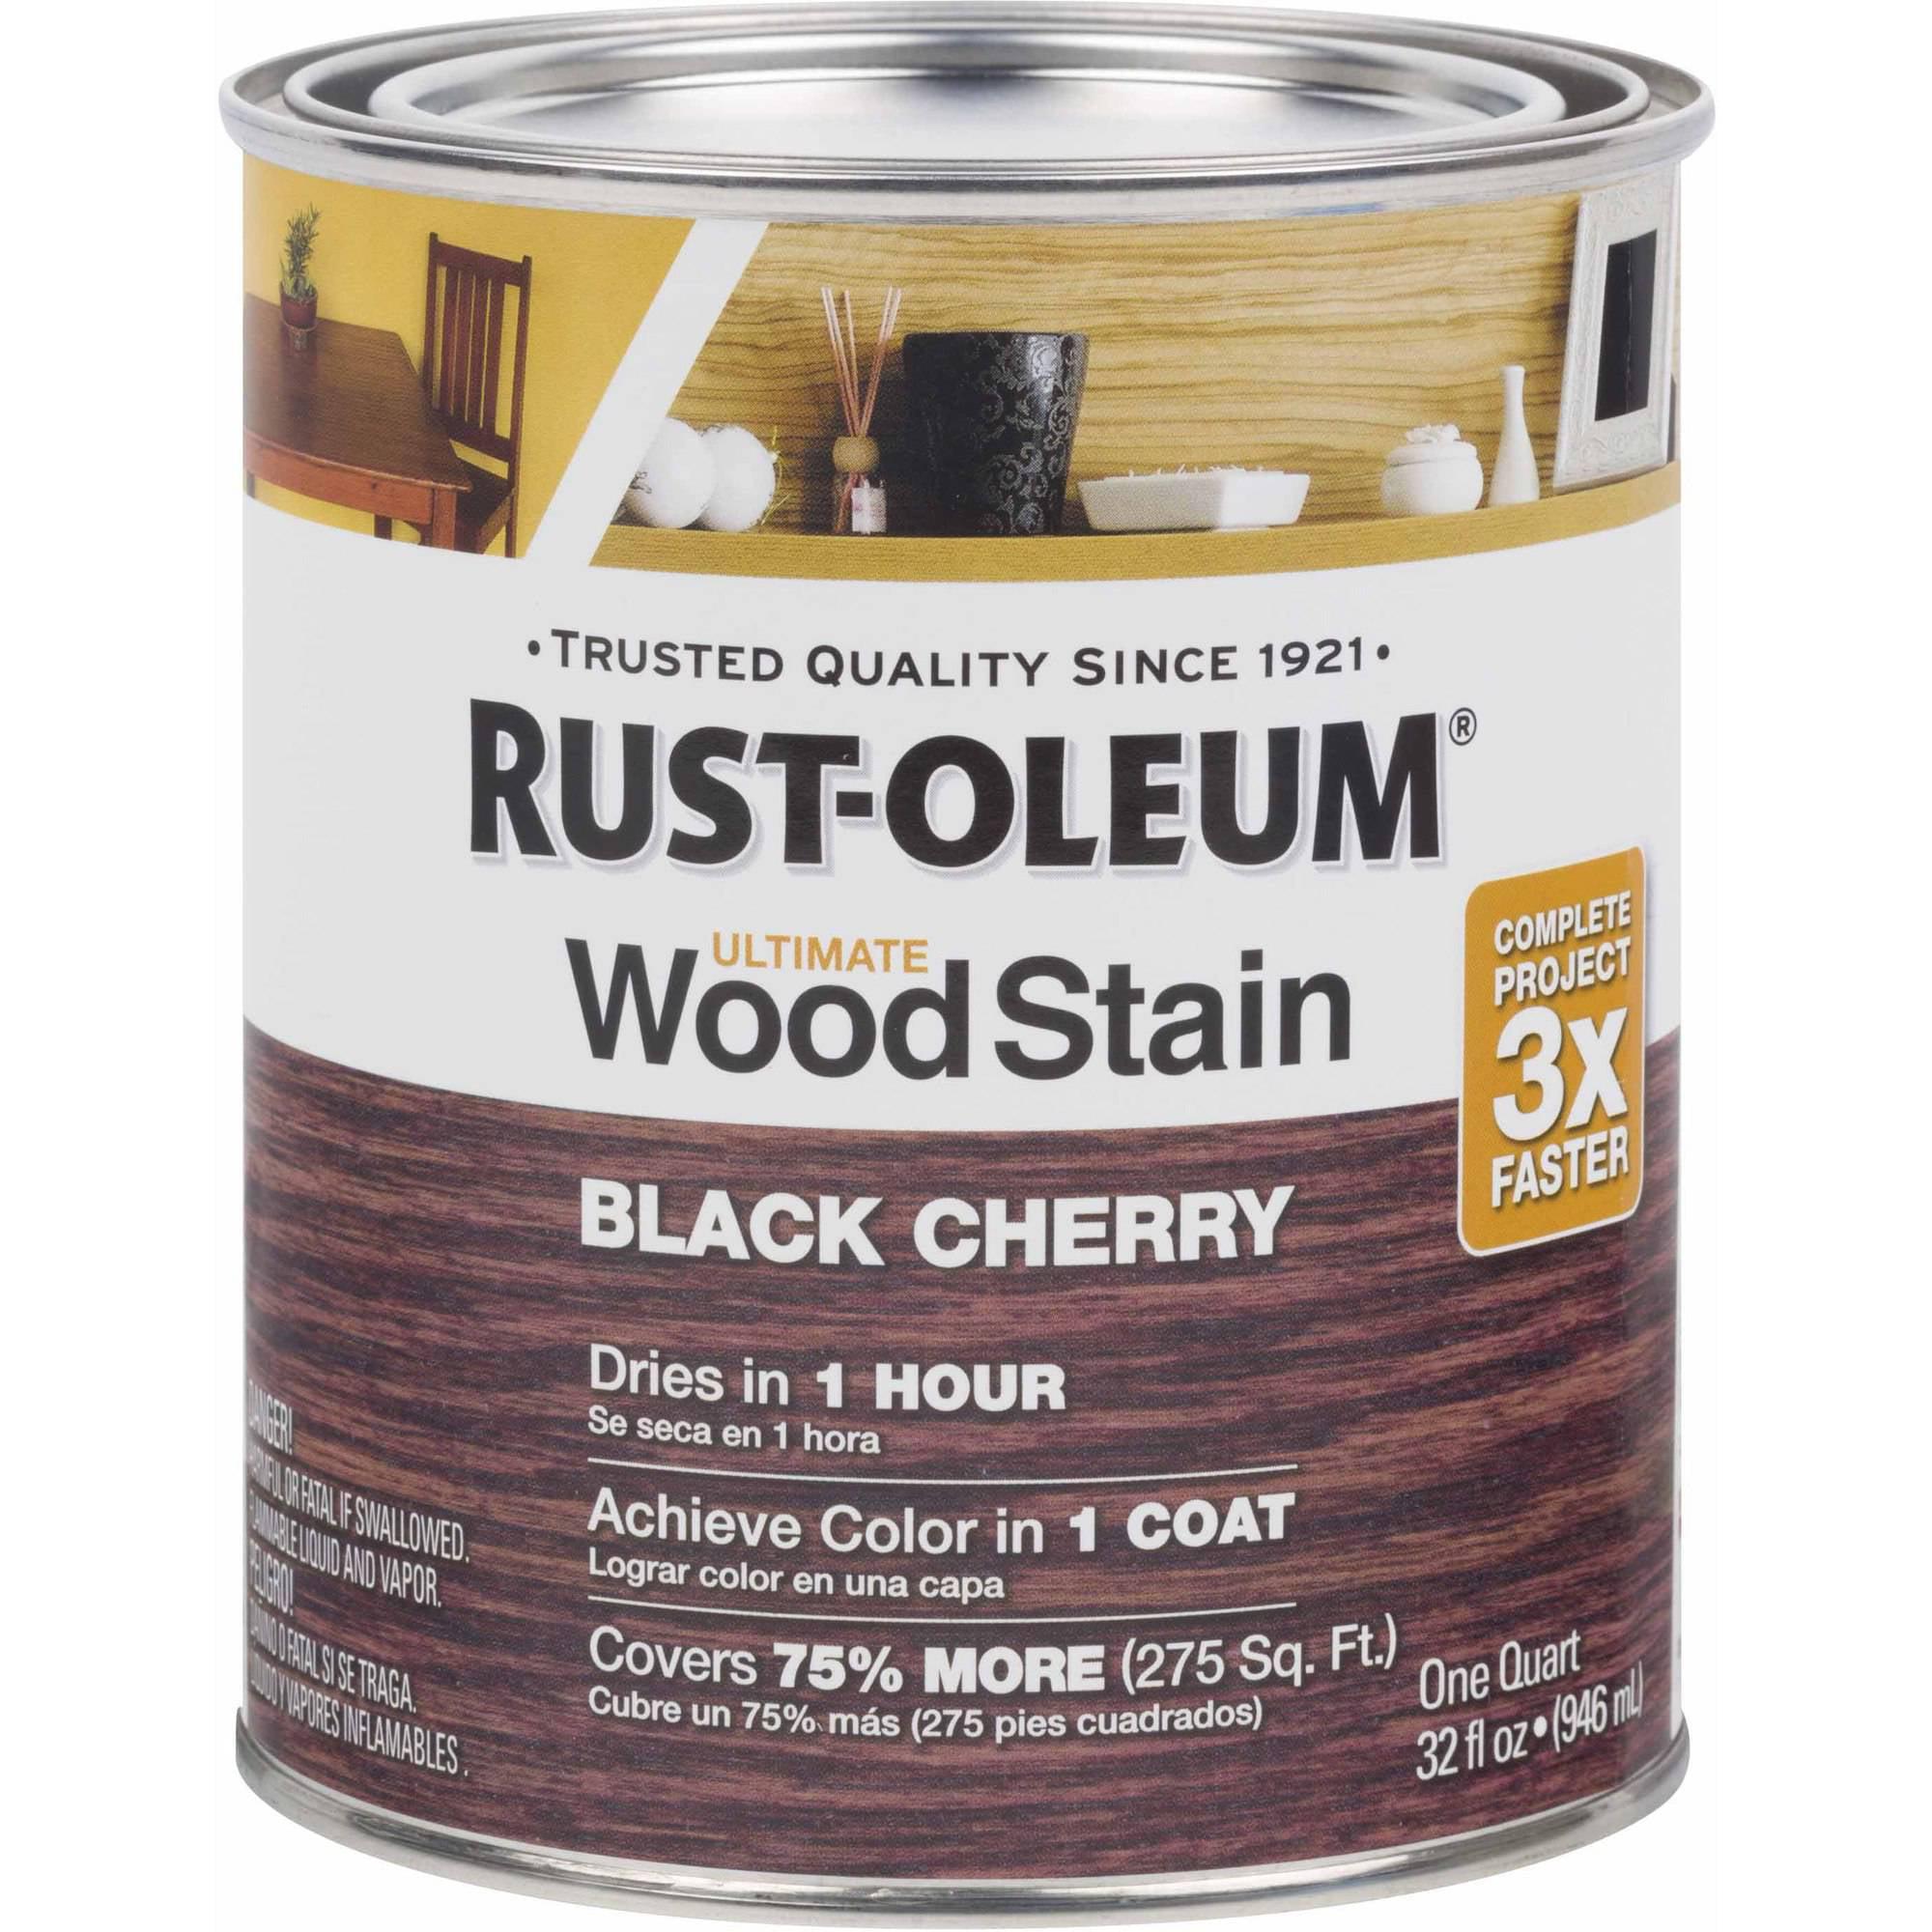 Rust-Oleum Ultimate Wood Stain Quart, Black Cherry